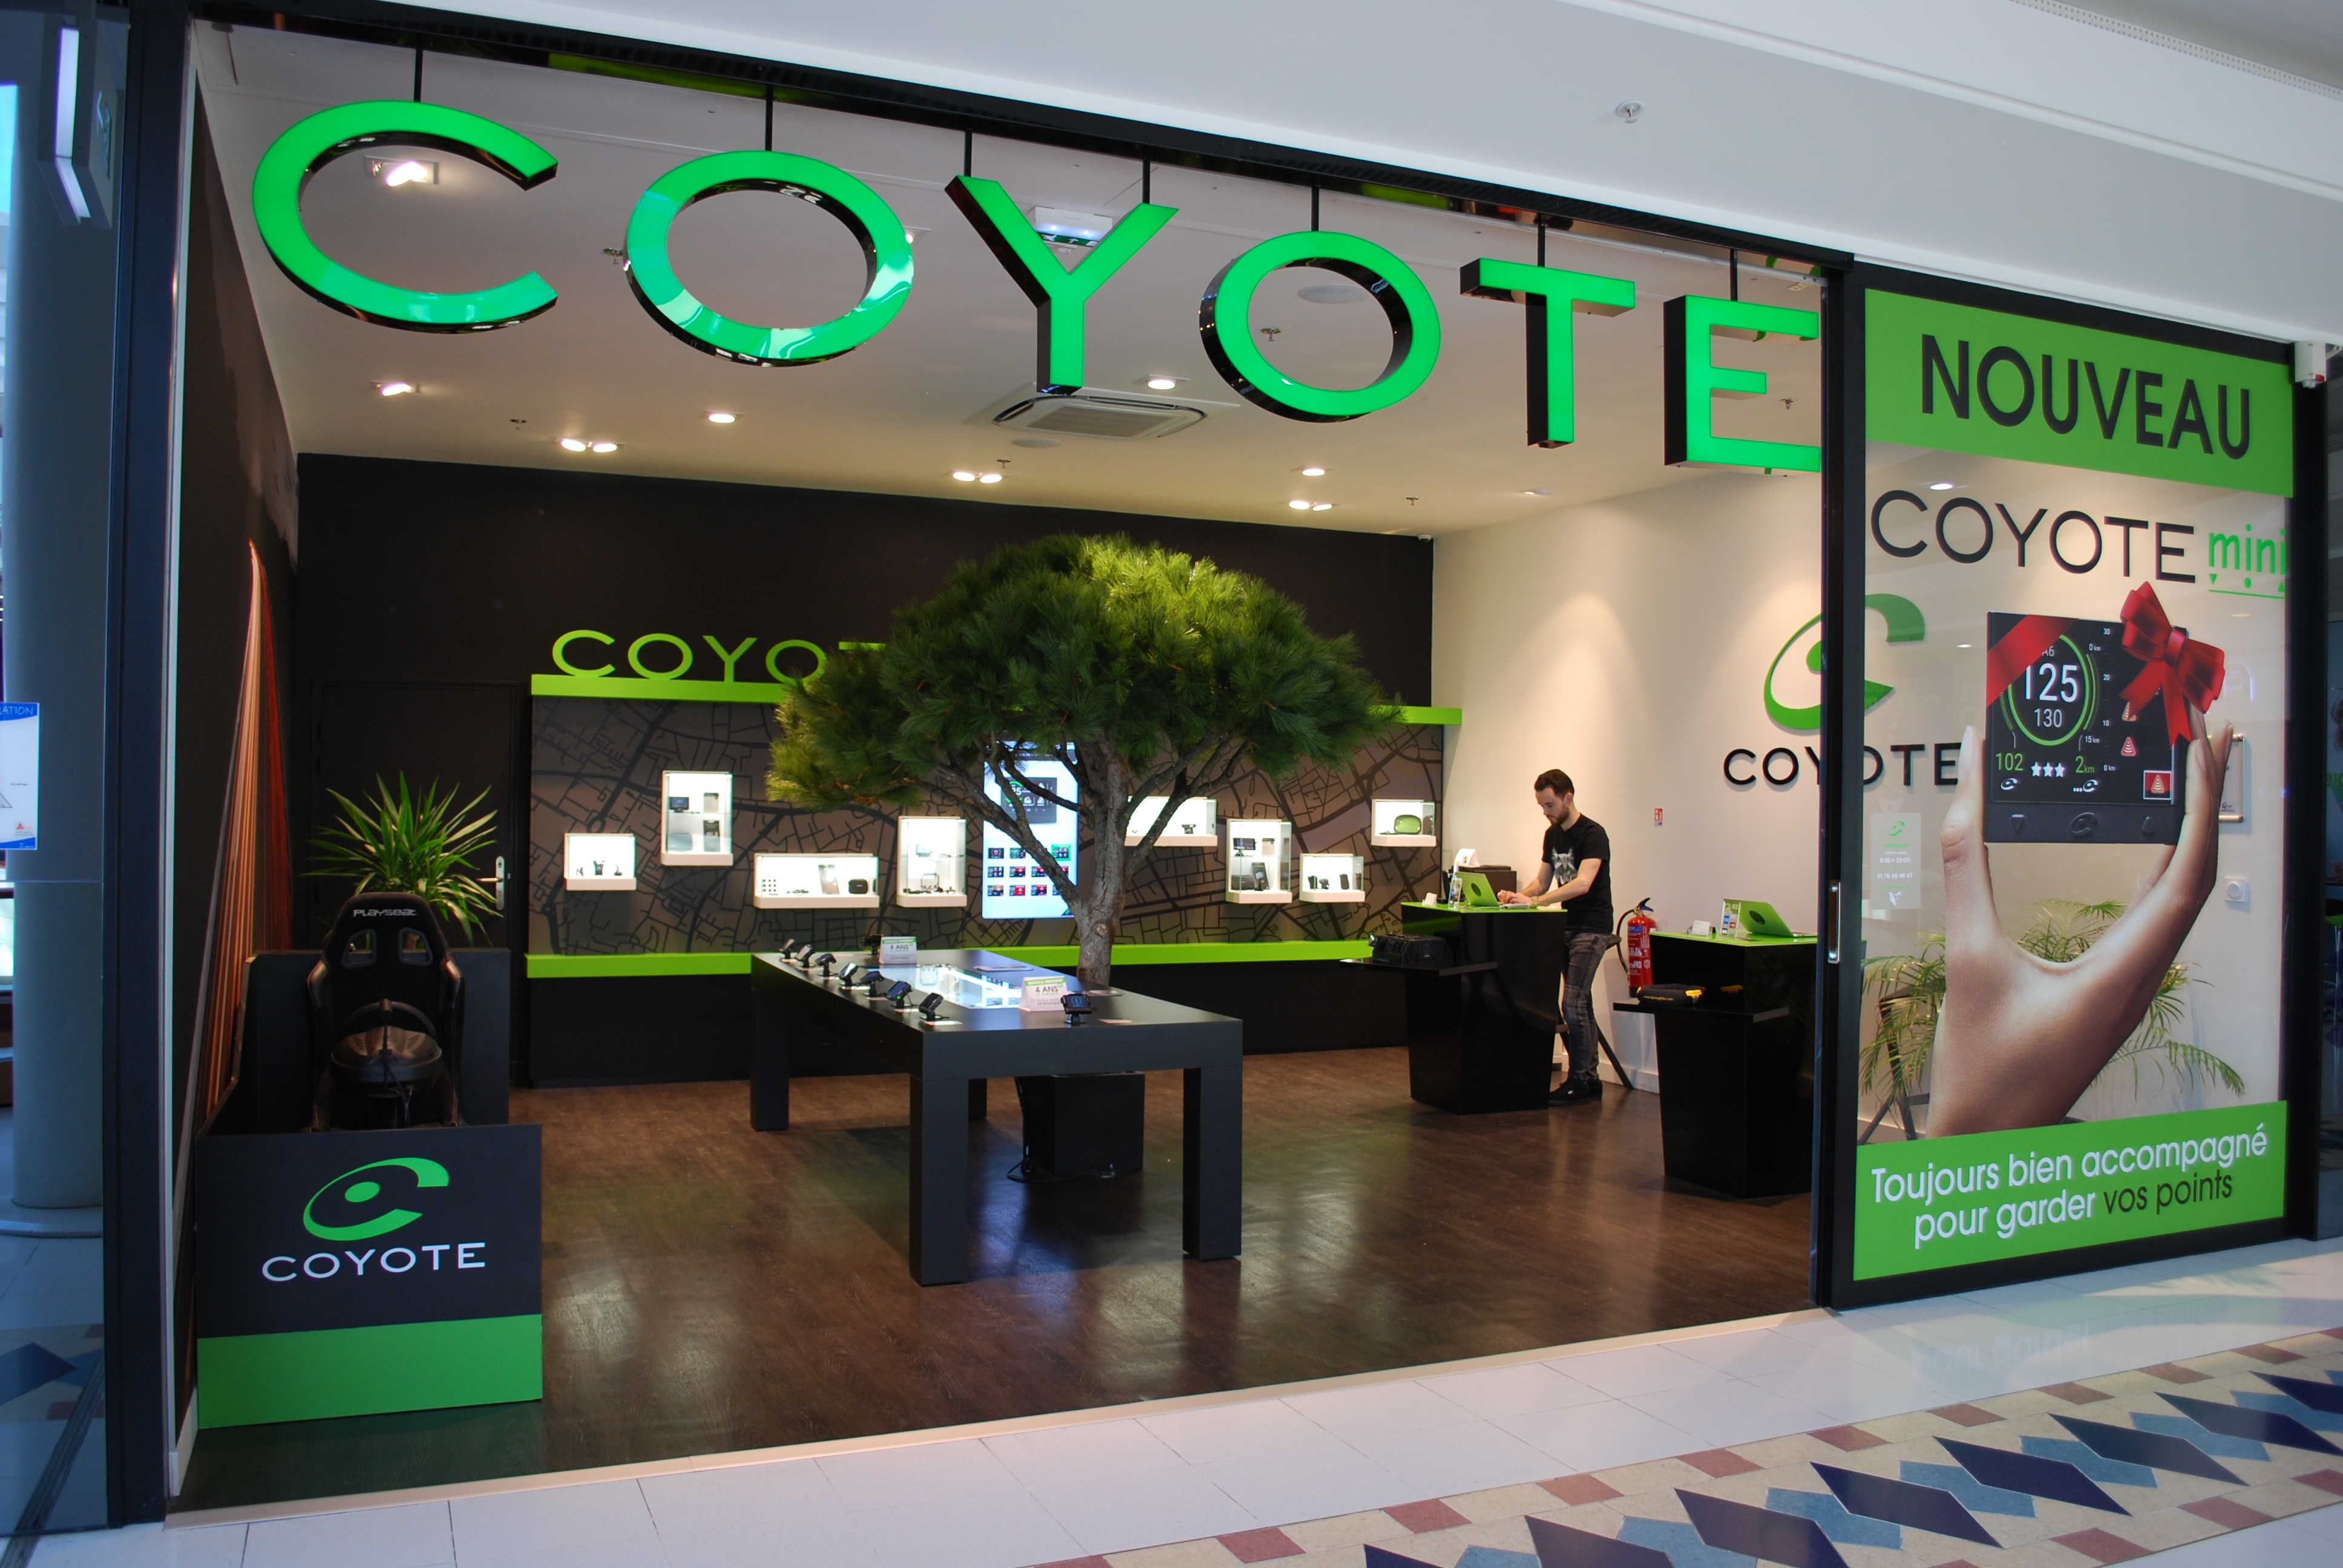 magasin coyote nantes tout l quipement du bo tier gps et info trafic coyote. Black Bedroom Furniture Sets. Home Design Ideas